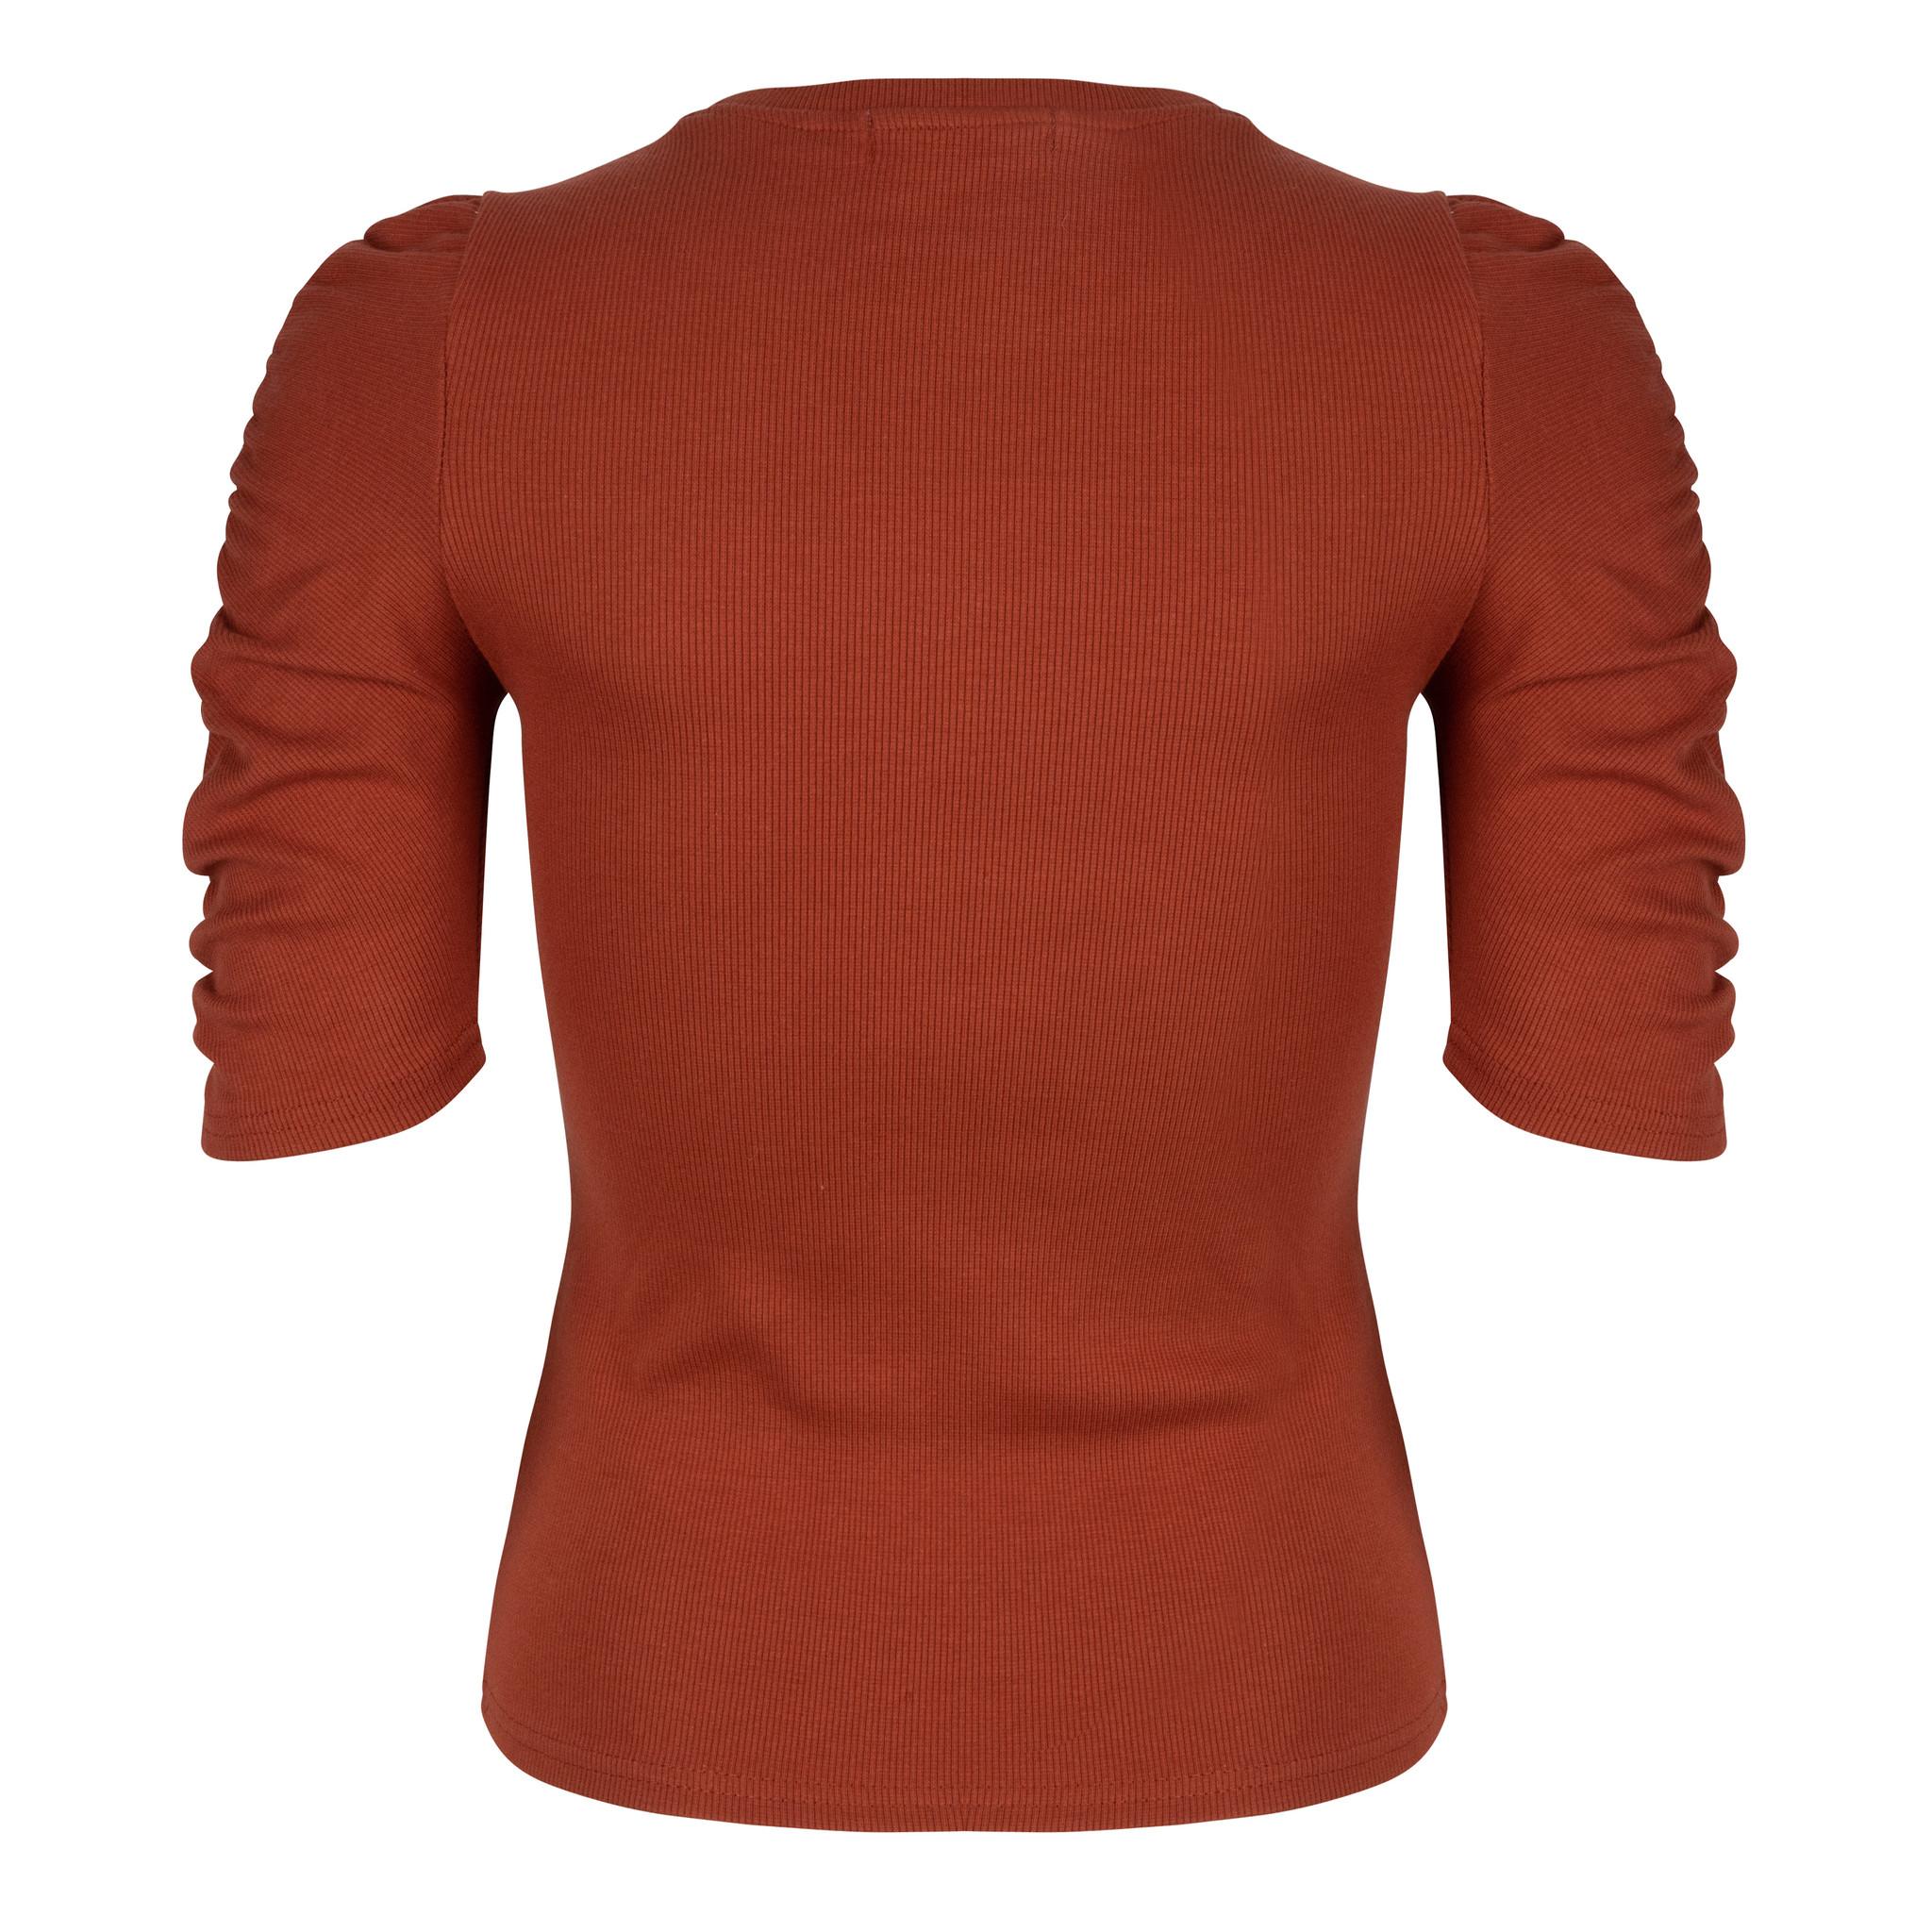 Lofty Manner Rust brown Top Adinda